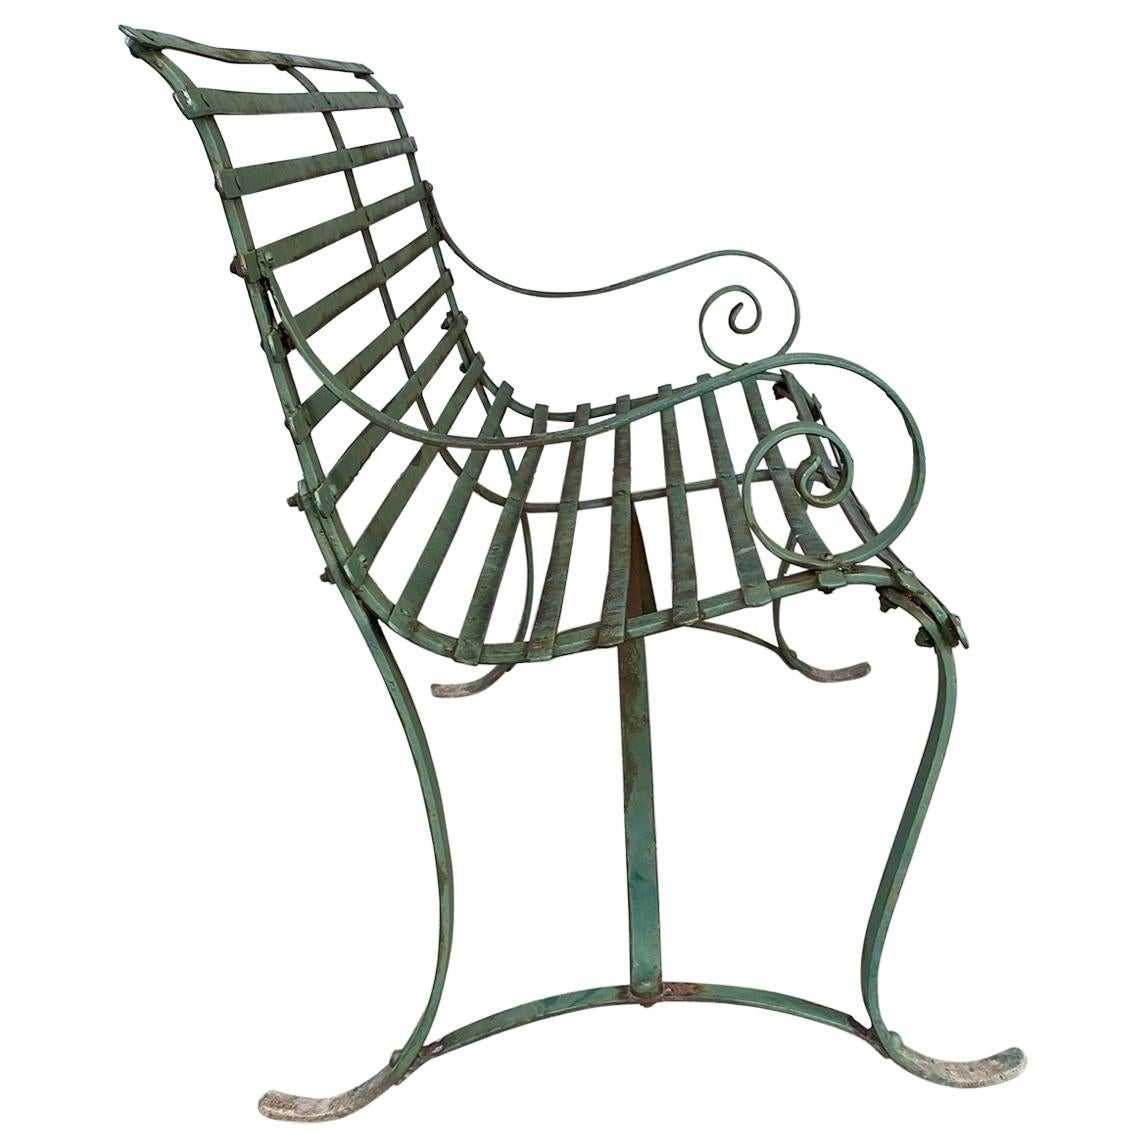 Simple, Late 19th Century, Slat Design Iron Garden Bench